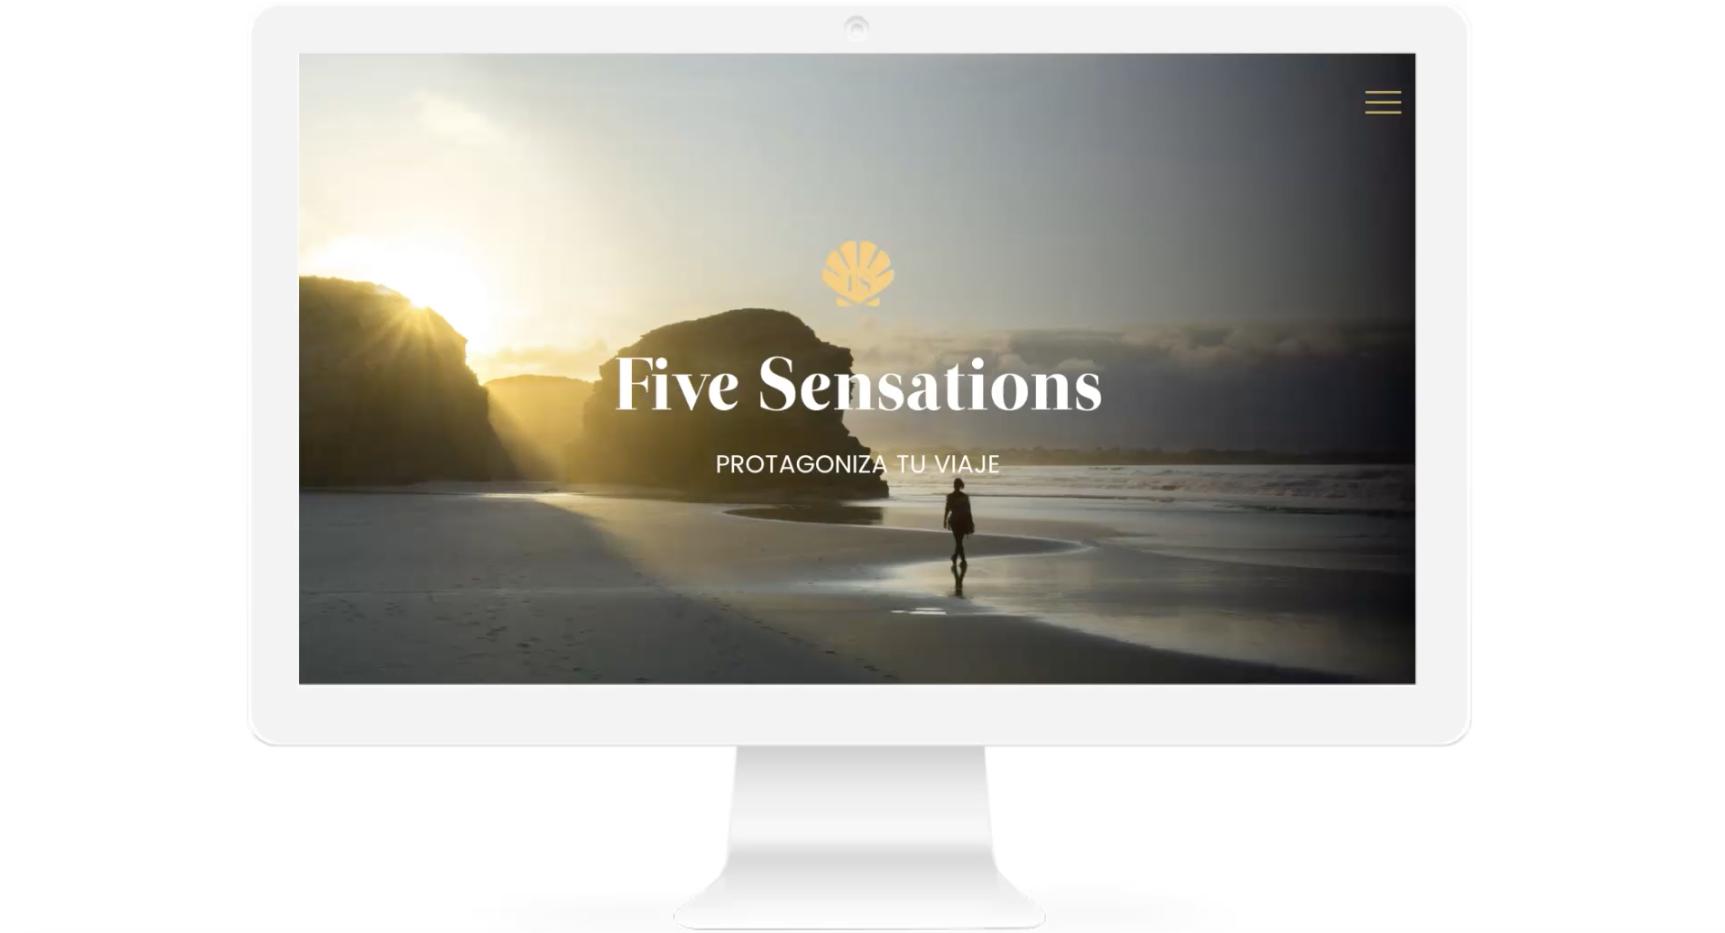 Five Sensations agencia viajes lujo diseño web